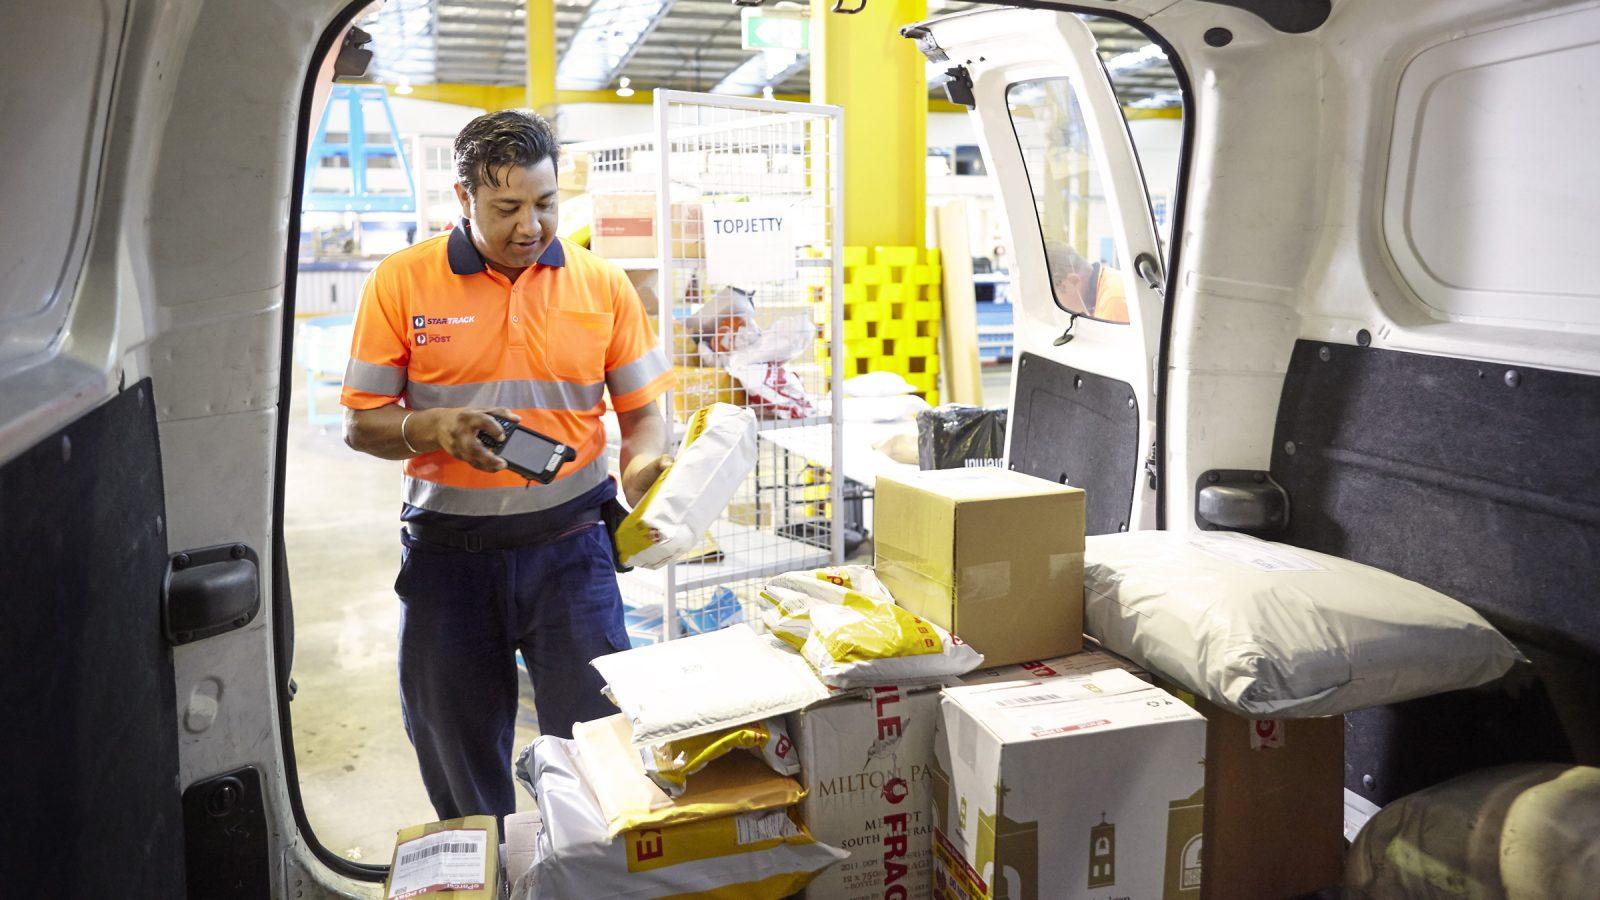 photo-delivery-driver-scanning-parcels-back-of-van.jpg.auspostimage.1600-0.medium.jpg